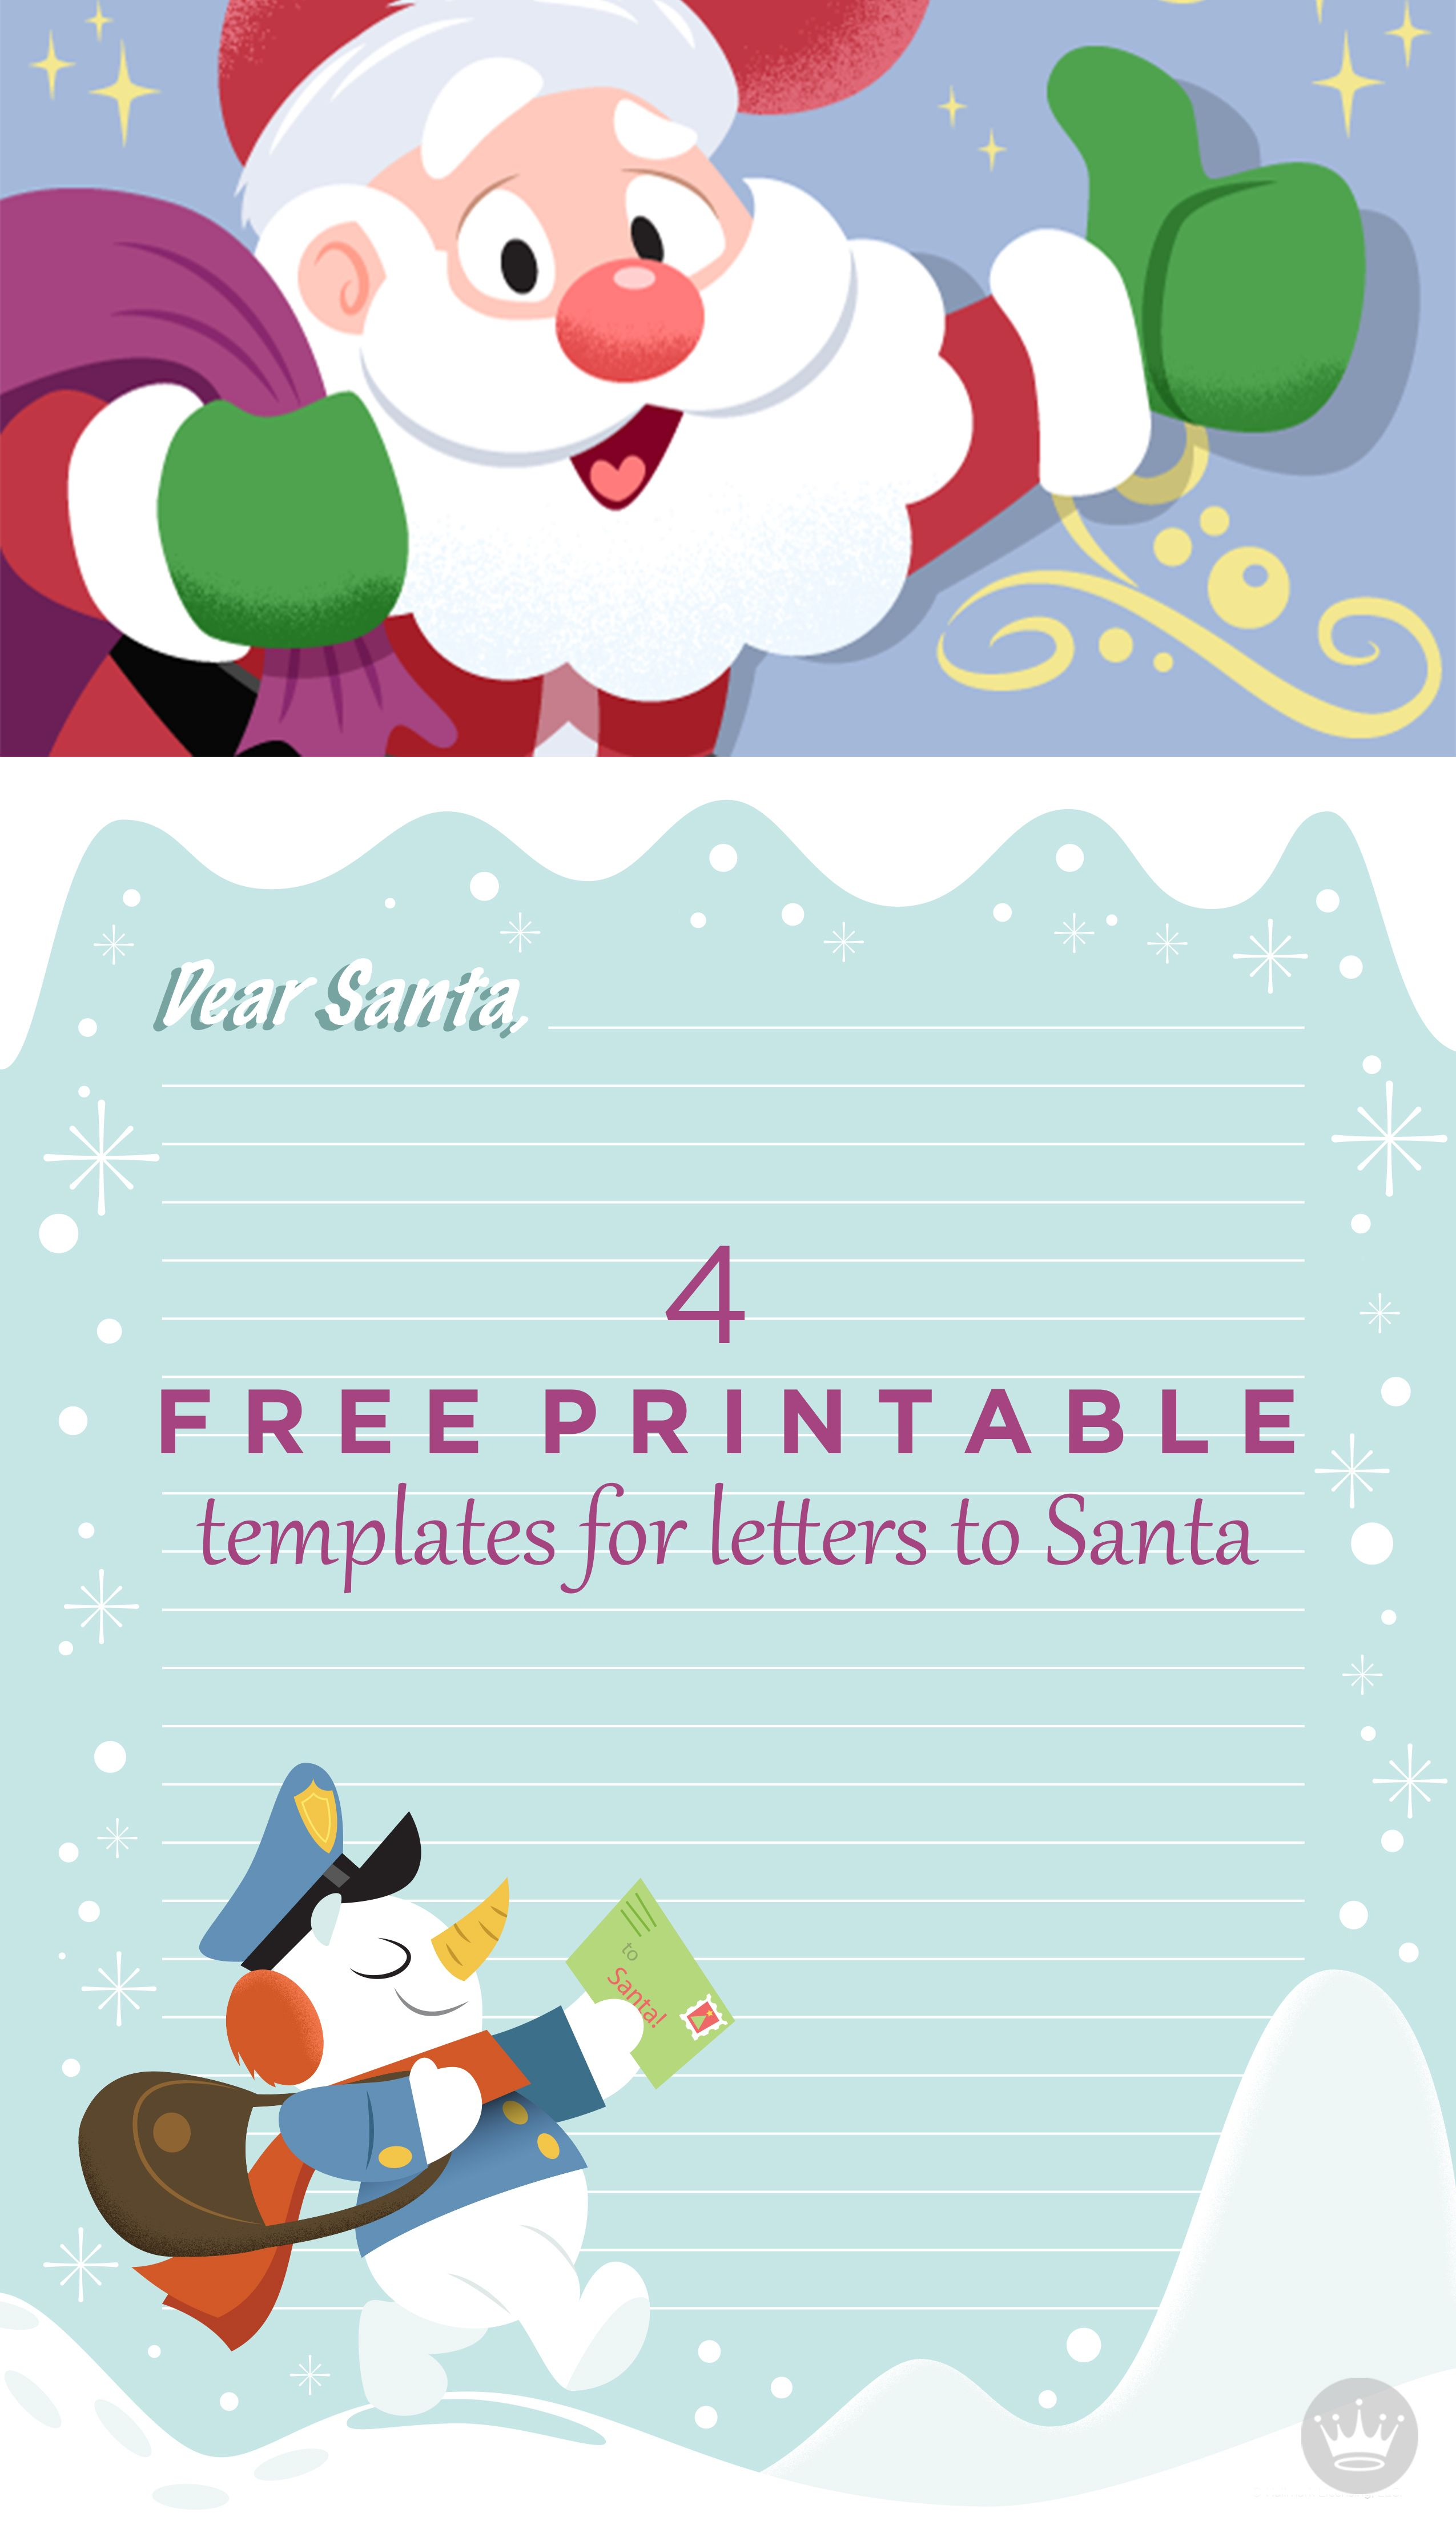 Dear Santa Free Printable Santa Letter Templates